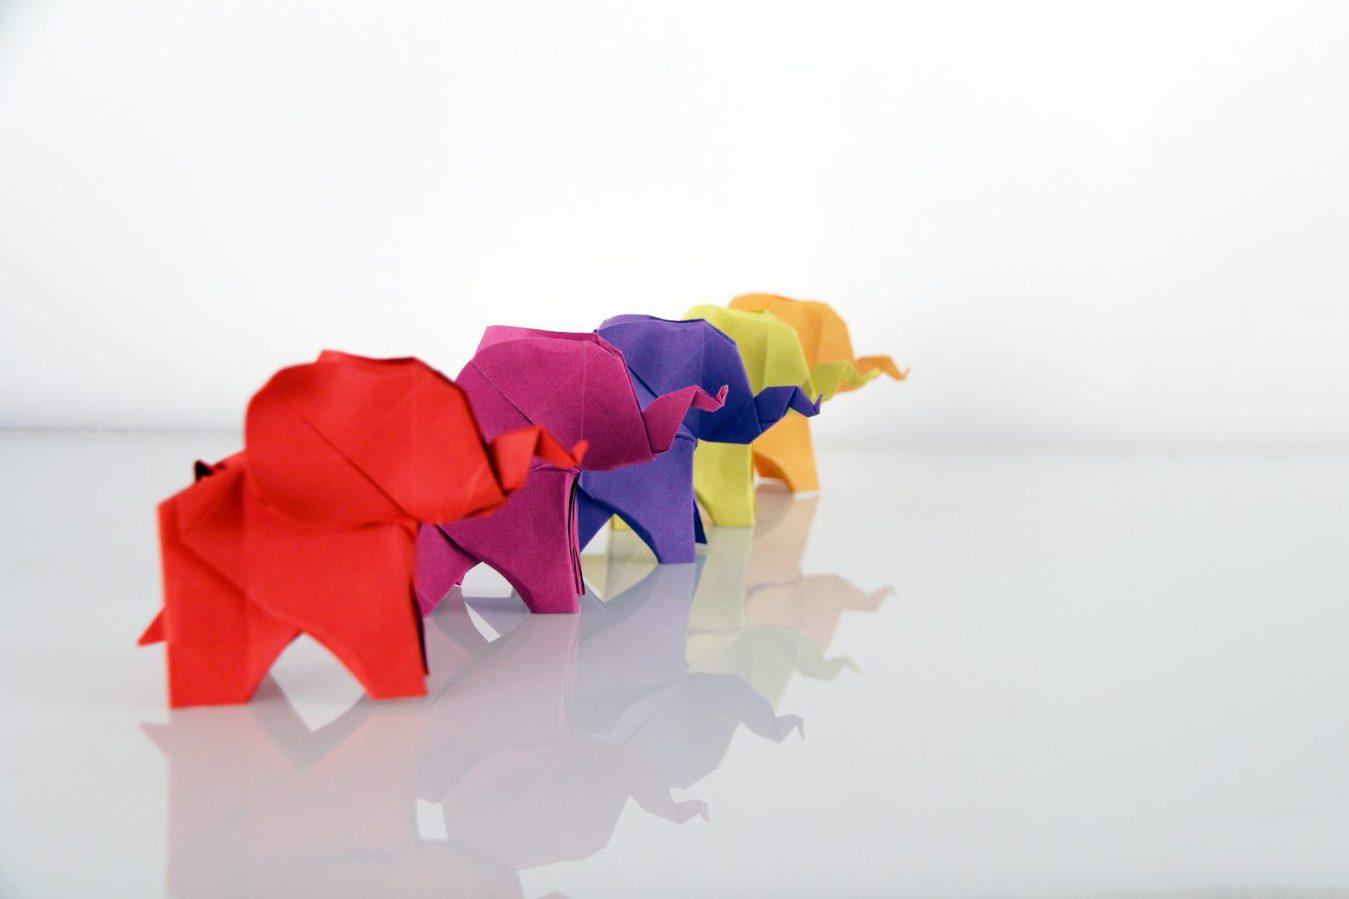 row of multicolored origami elephants